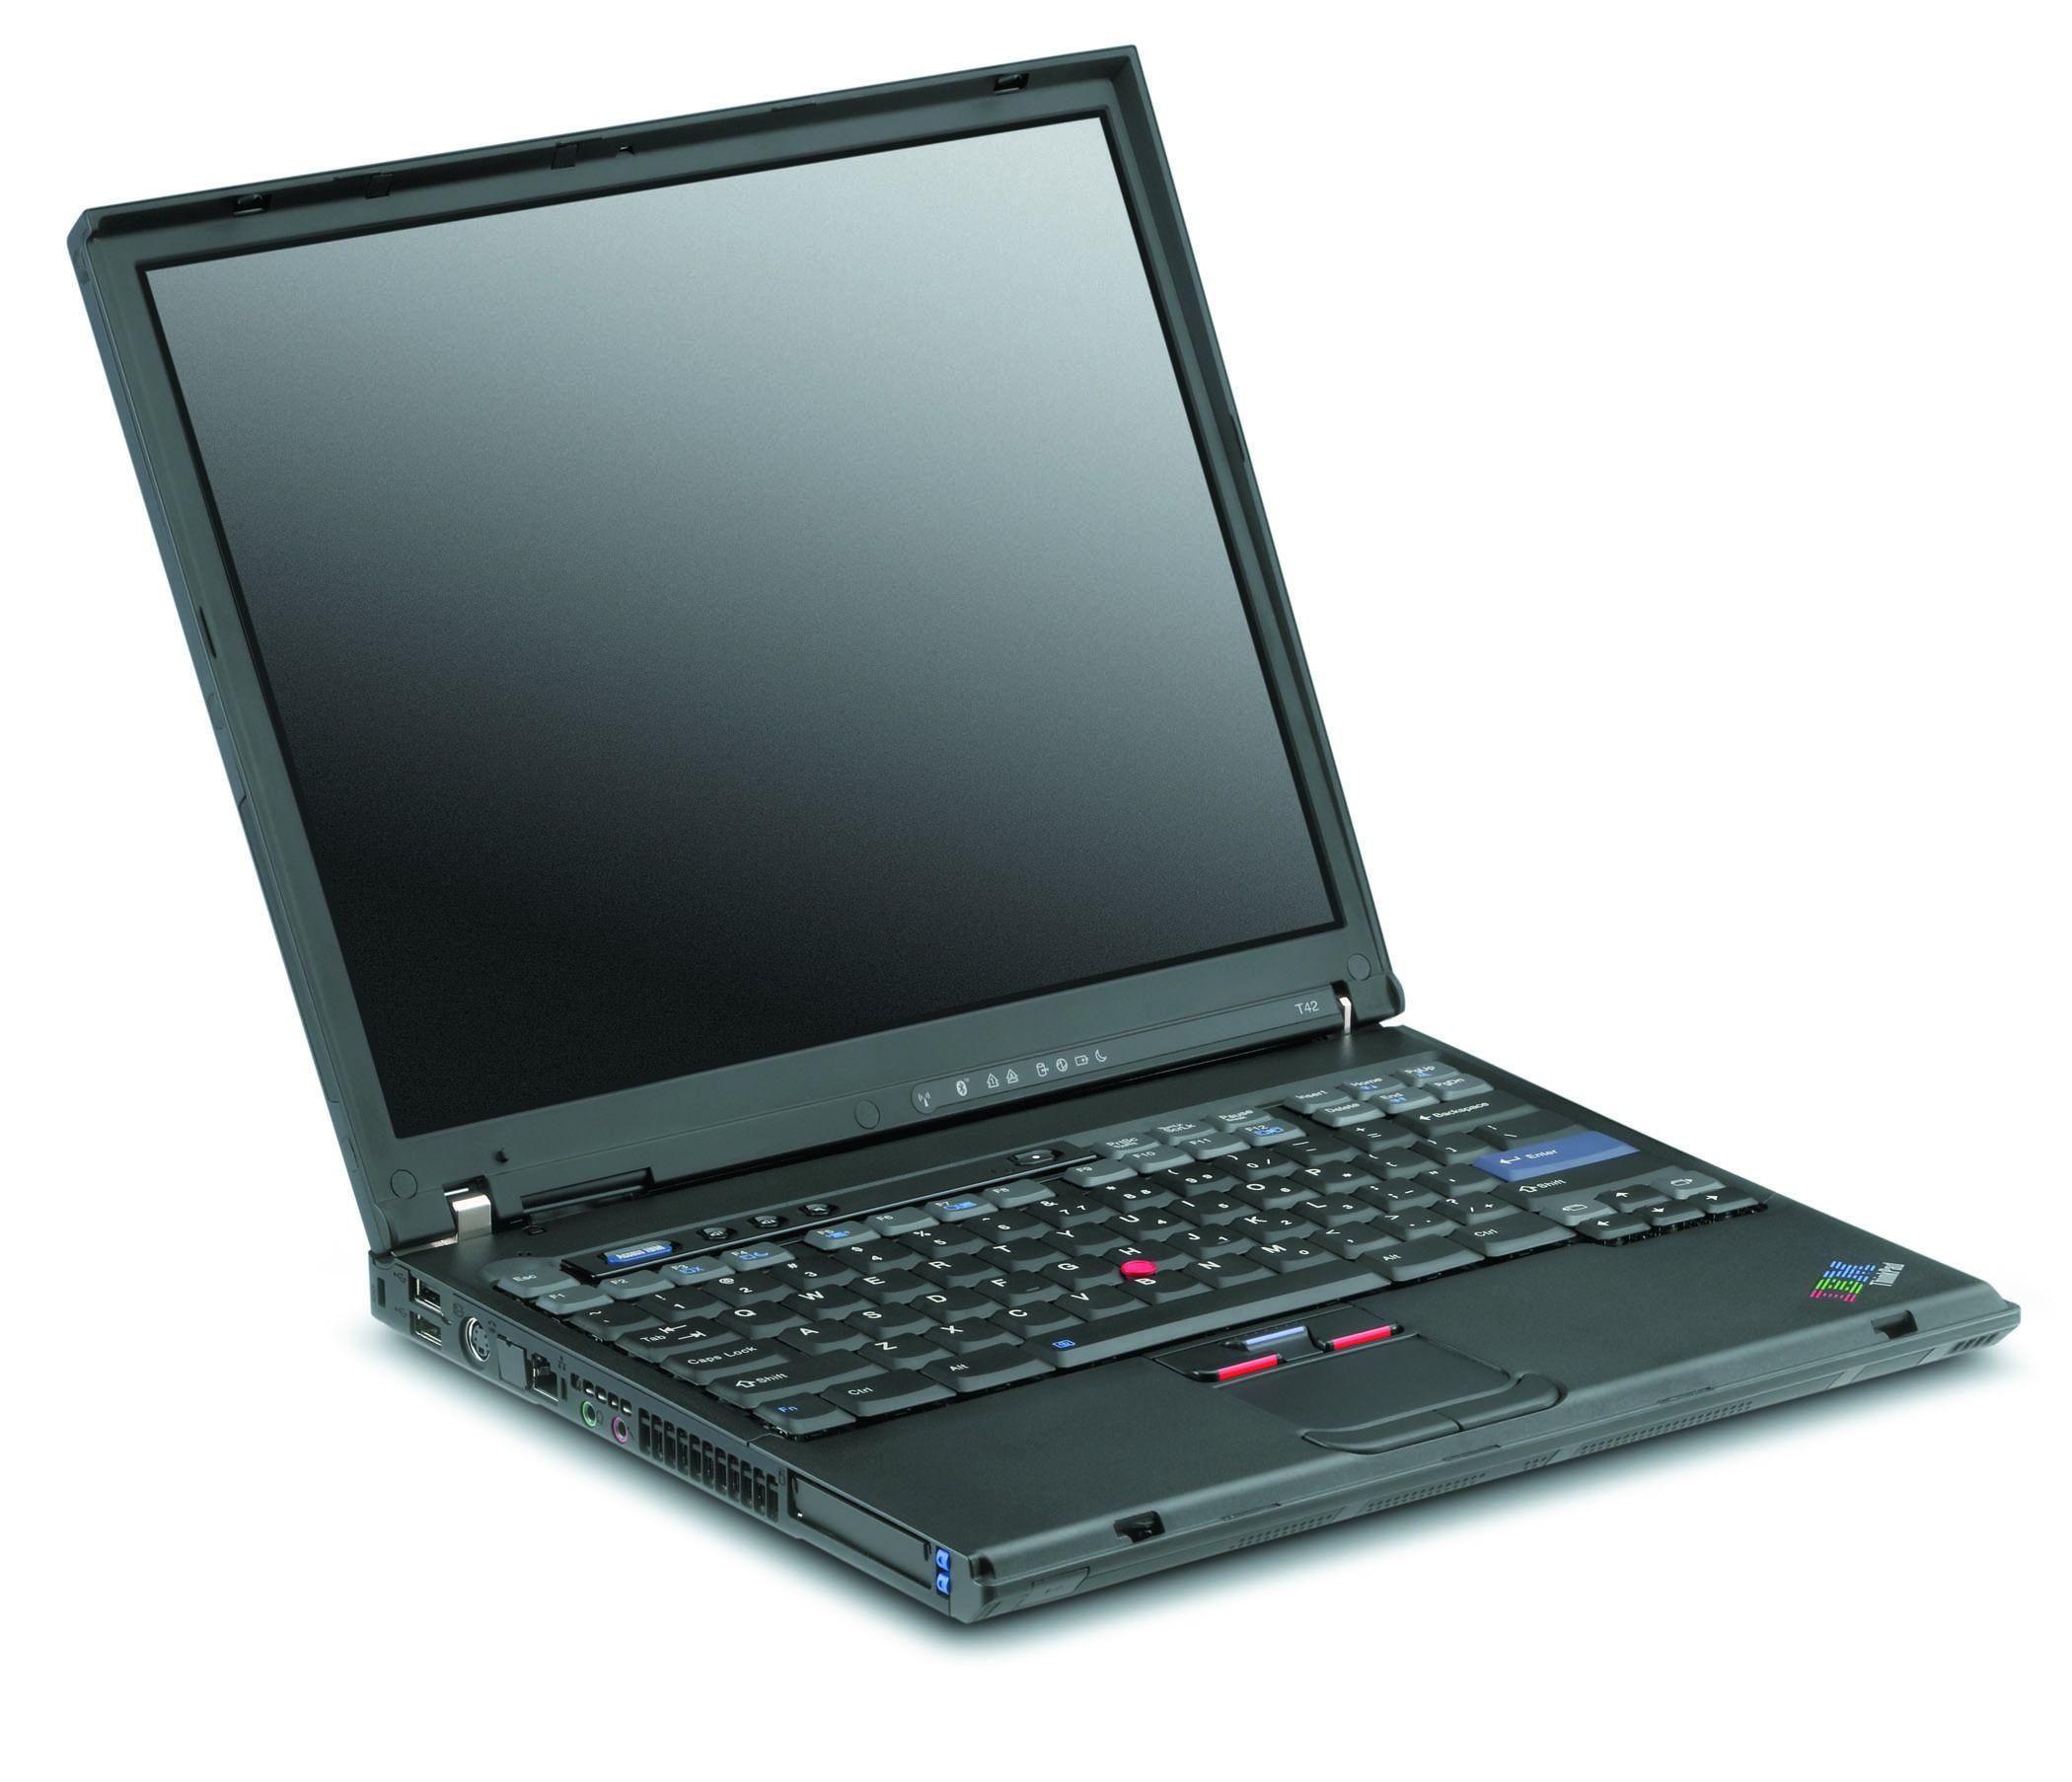 IBM Lenovo ThinkPad T42 PM Centrino Laptop Notebook DVD